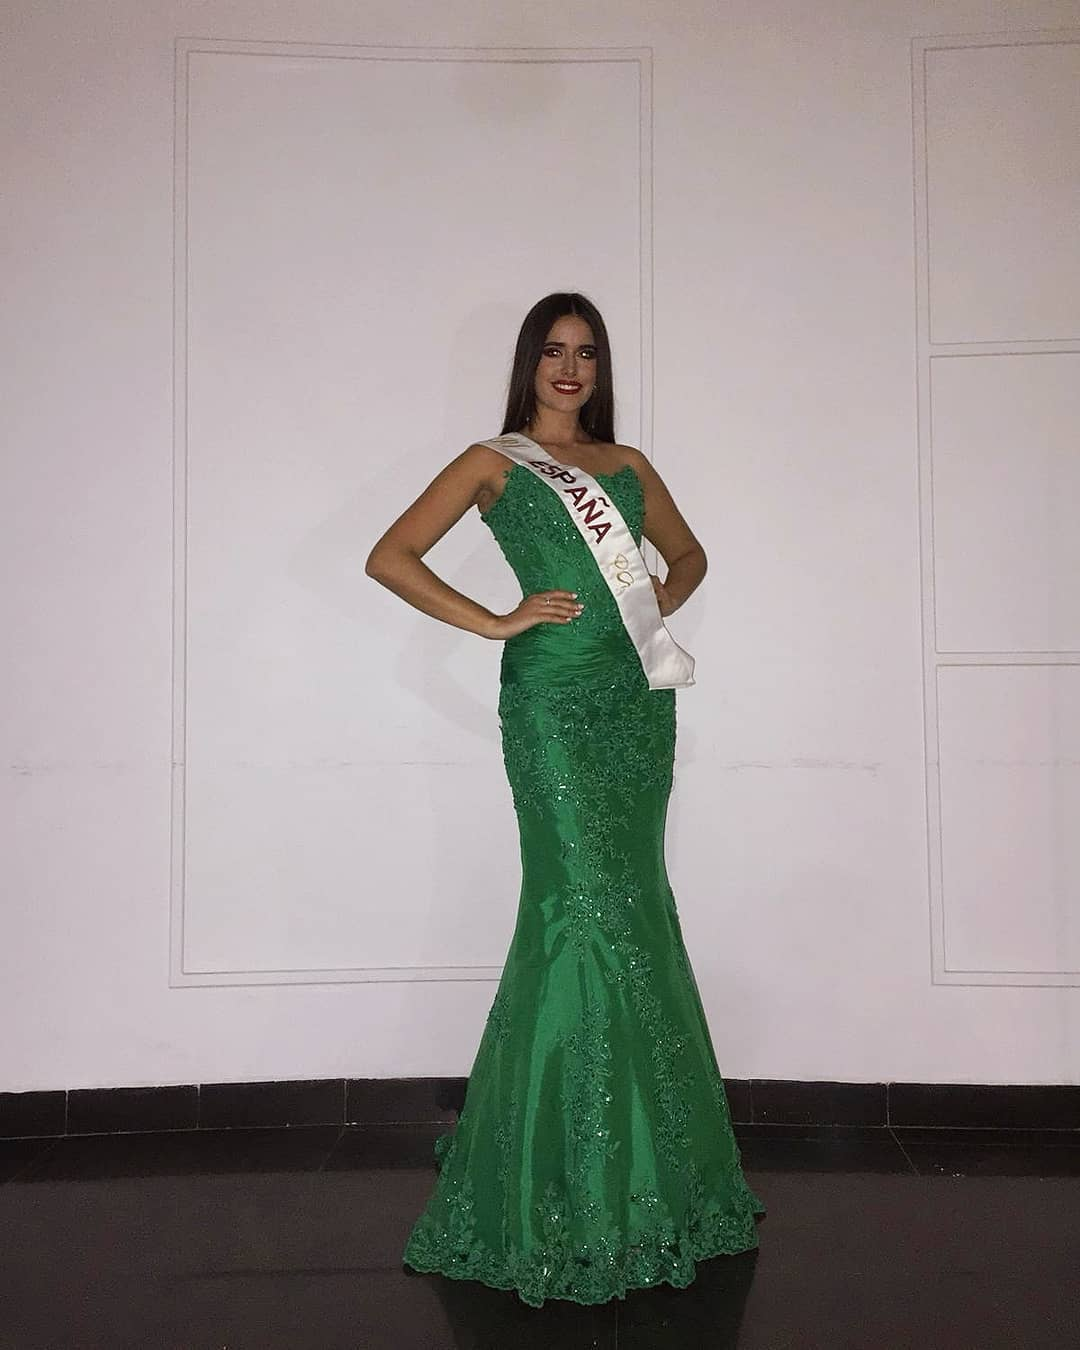 magnolia martinez, miss espana hispanoamericana 2018. - Página 3 43710410